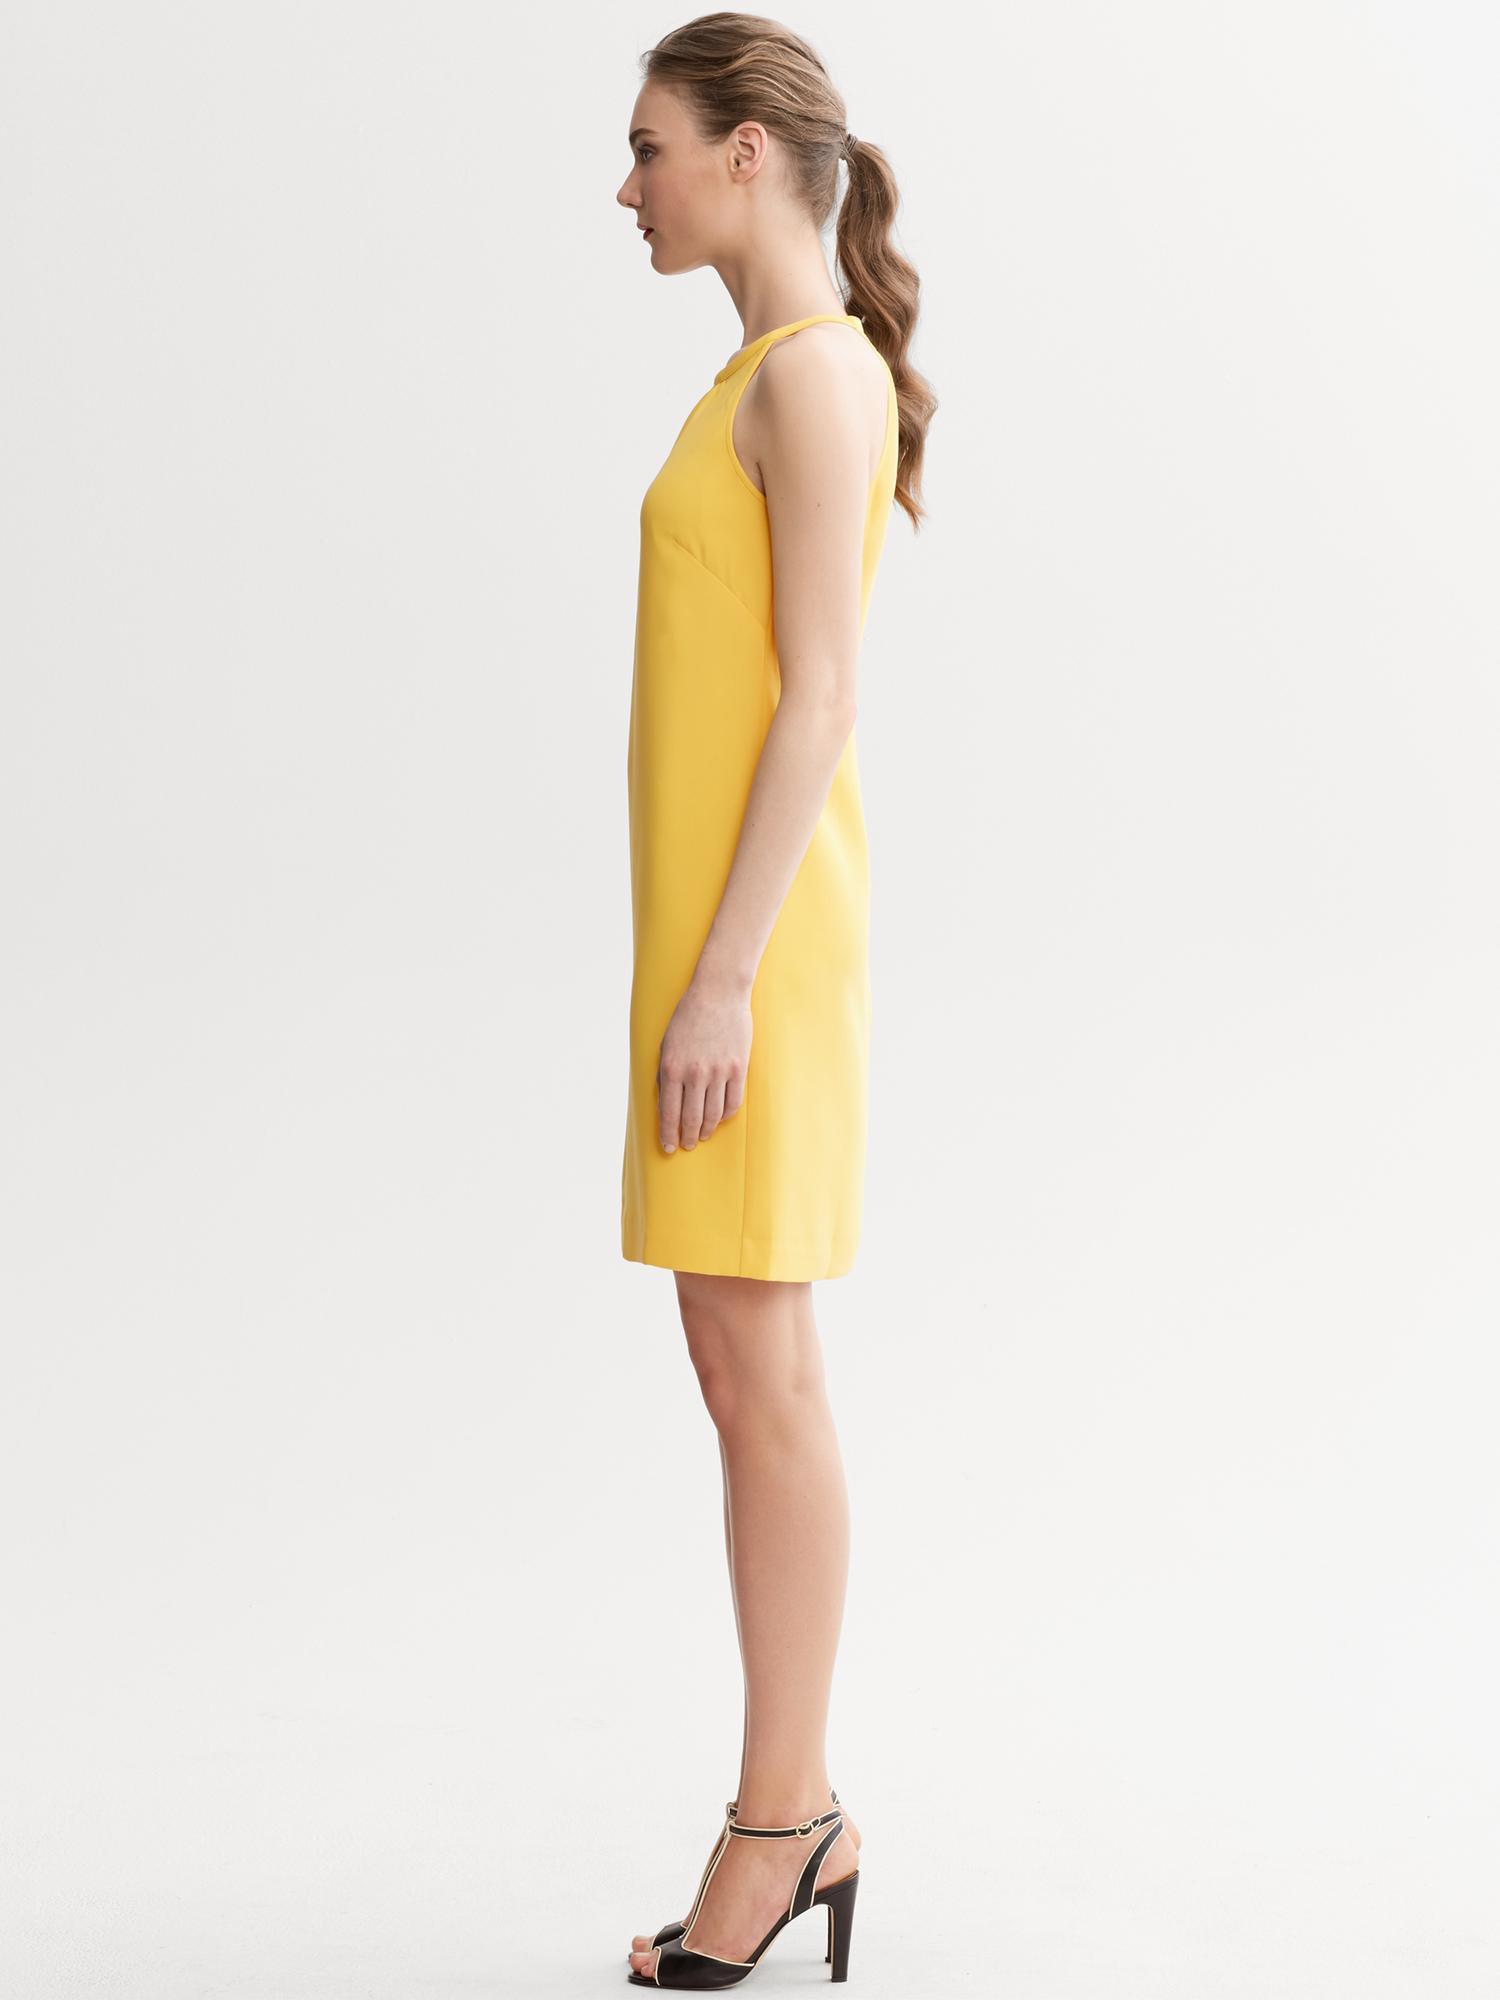 Lyst Banana Republic Yellow Halter Dress In Yellow